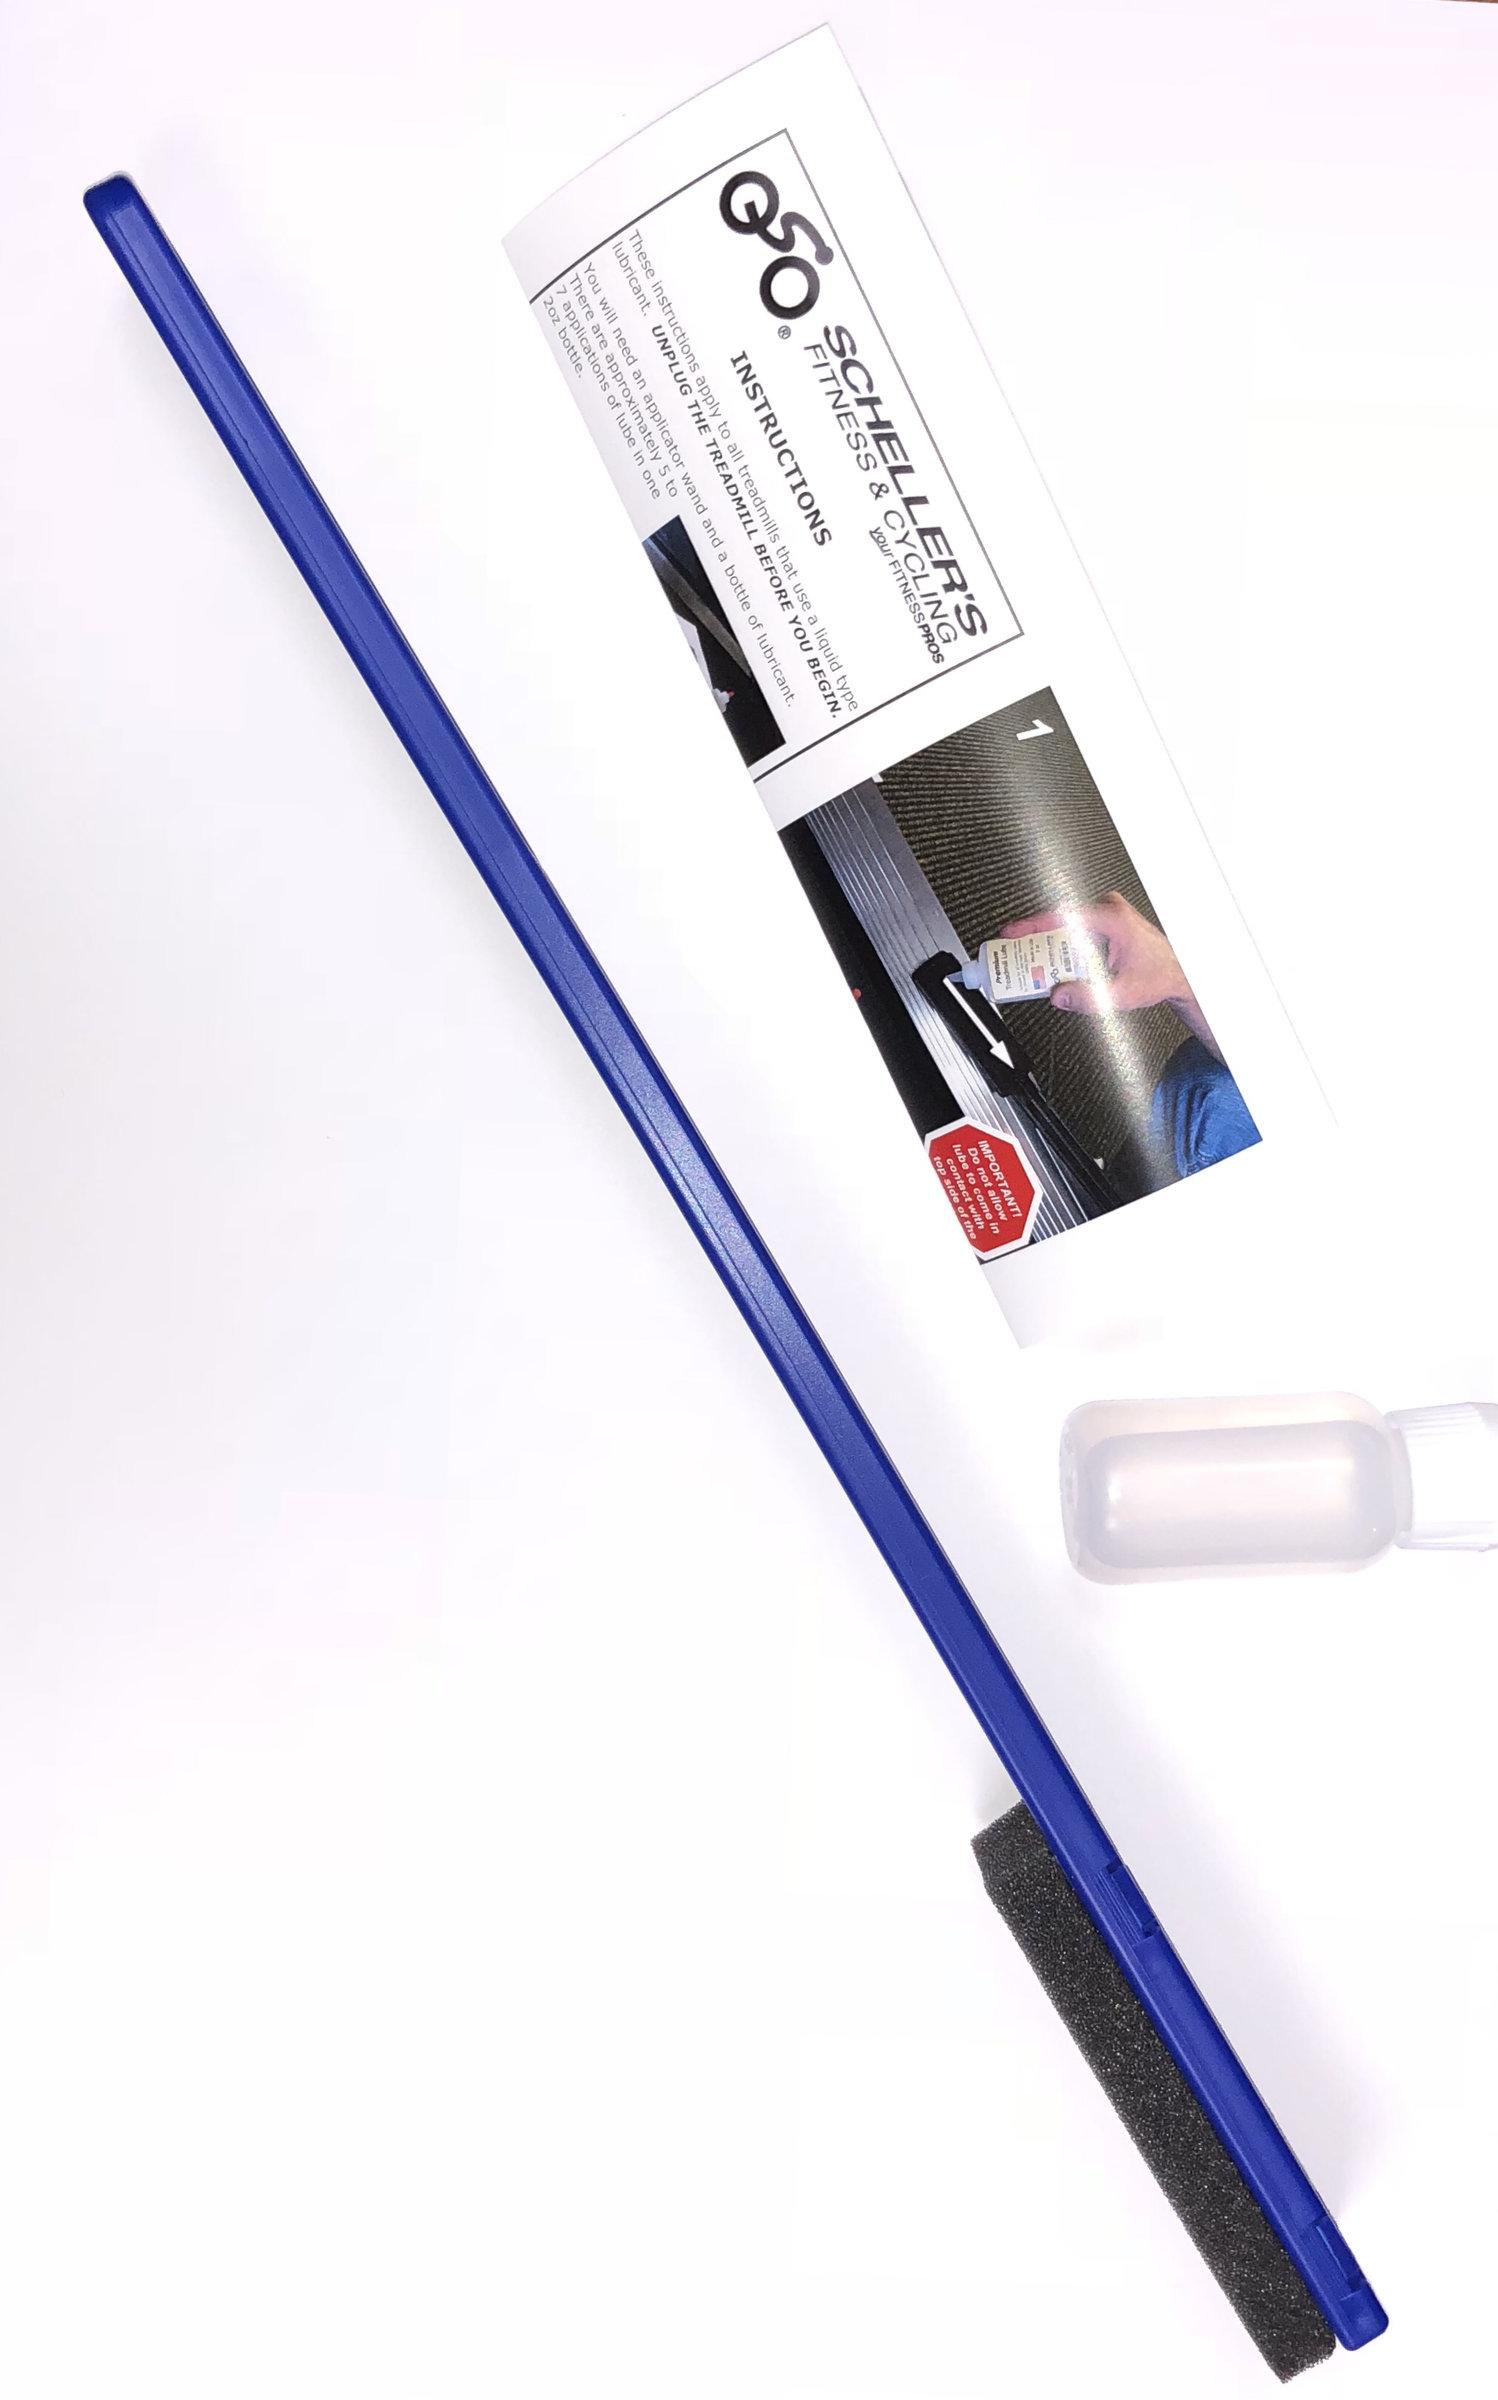 Treadmill Lube Kit Applicator & Lubricant